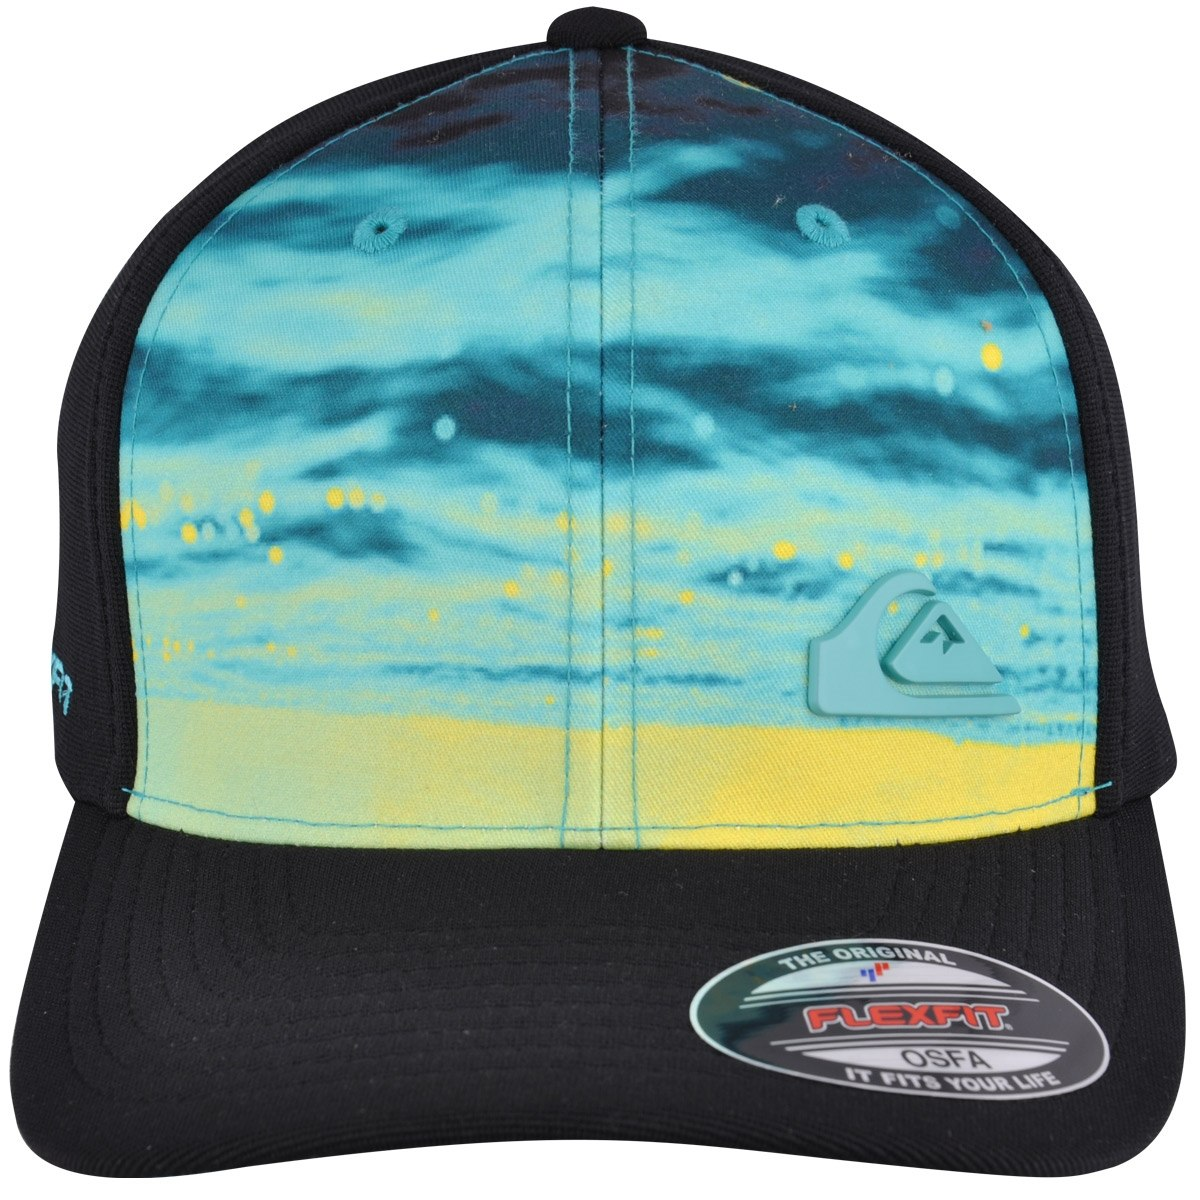 Boné Quiksilver How Down Preto - Cut Wave - R  129,90 em Mercado Livre 16ab60c677